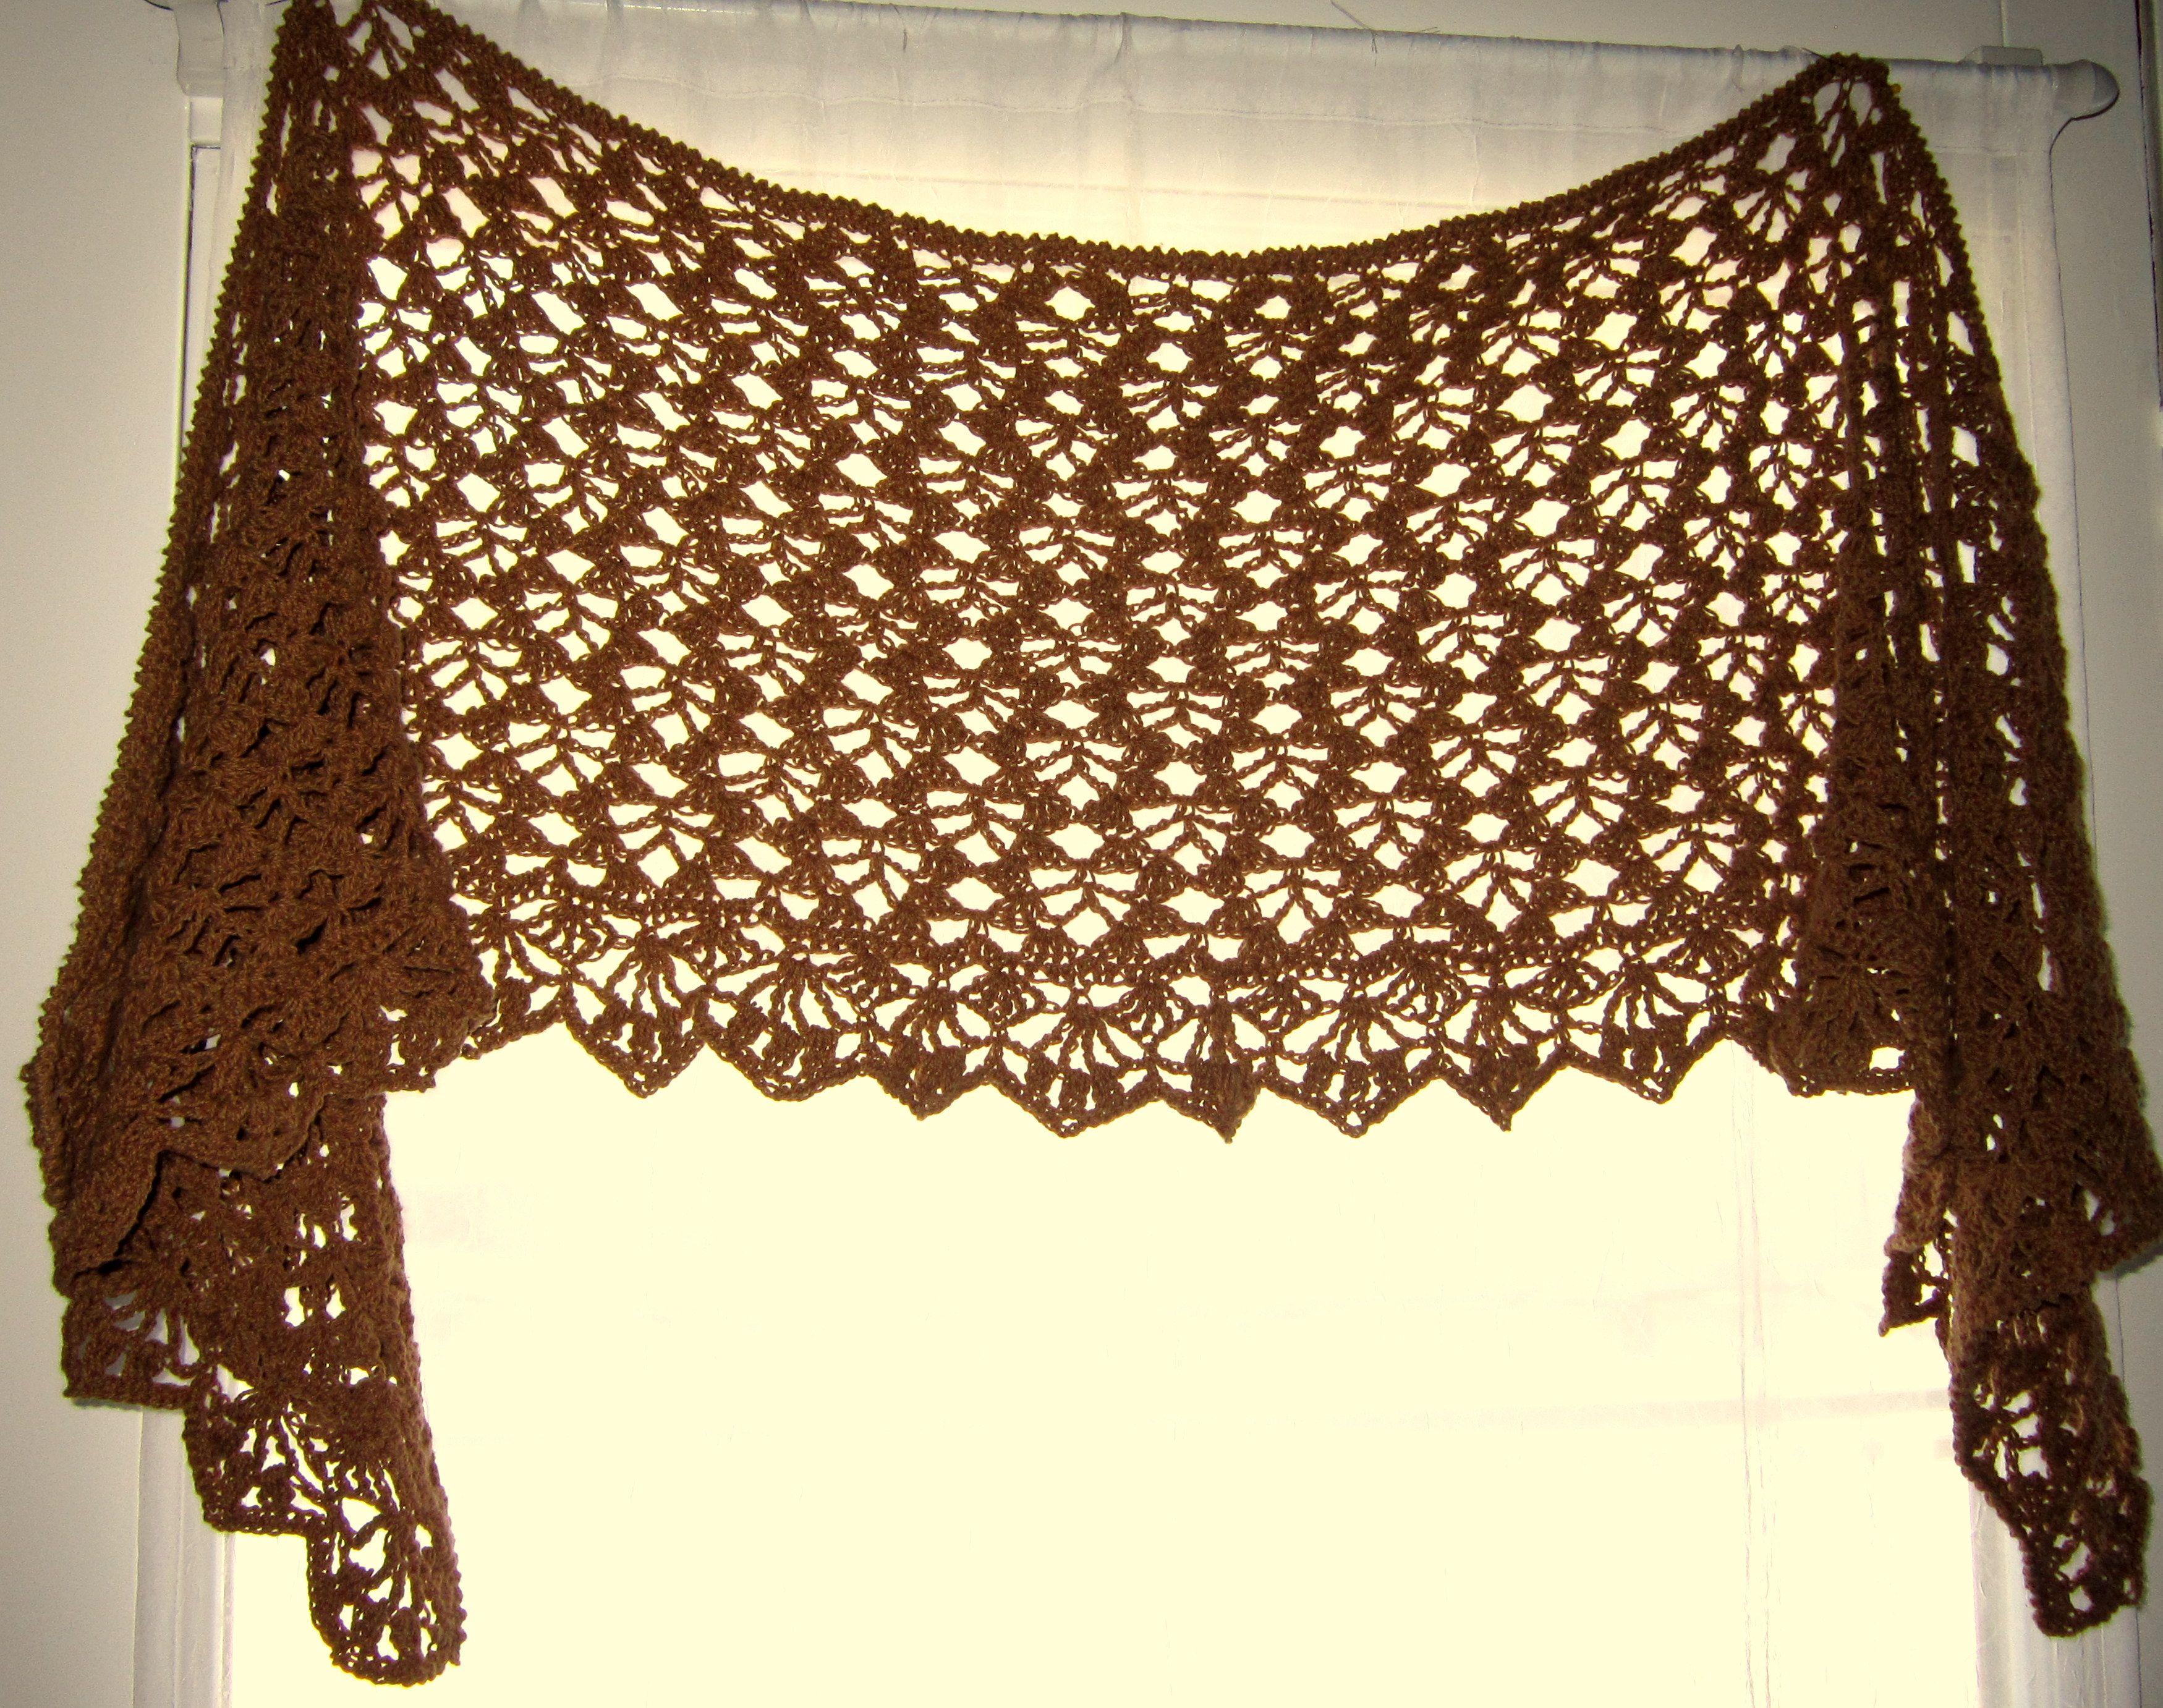 Crochet patterns free crochet shawl pattern wolf crochet crochet patterns free crochet shawl pattern wolf crochet dt1010fo